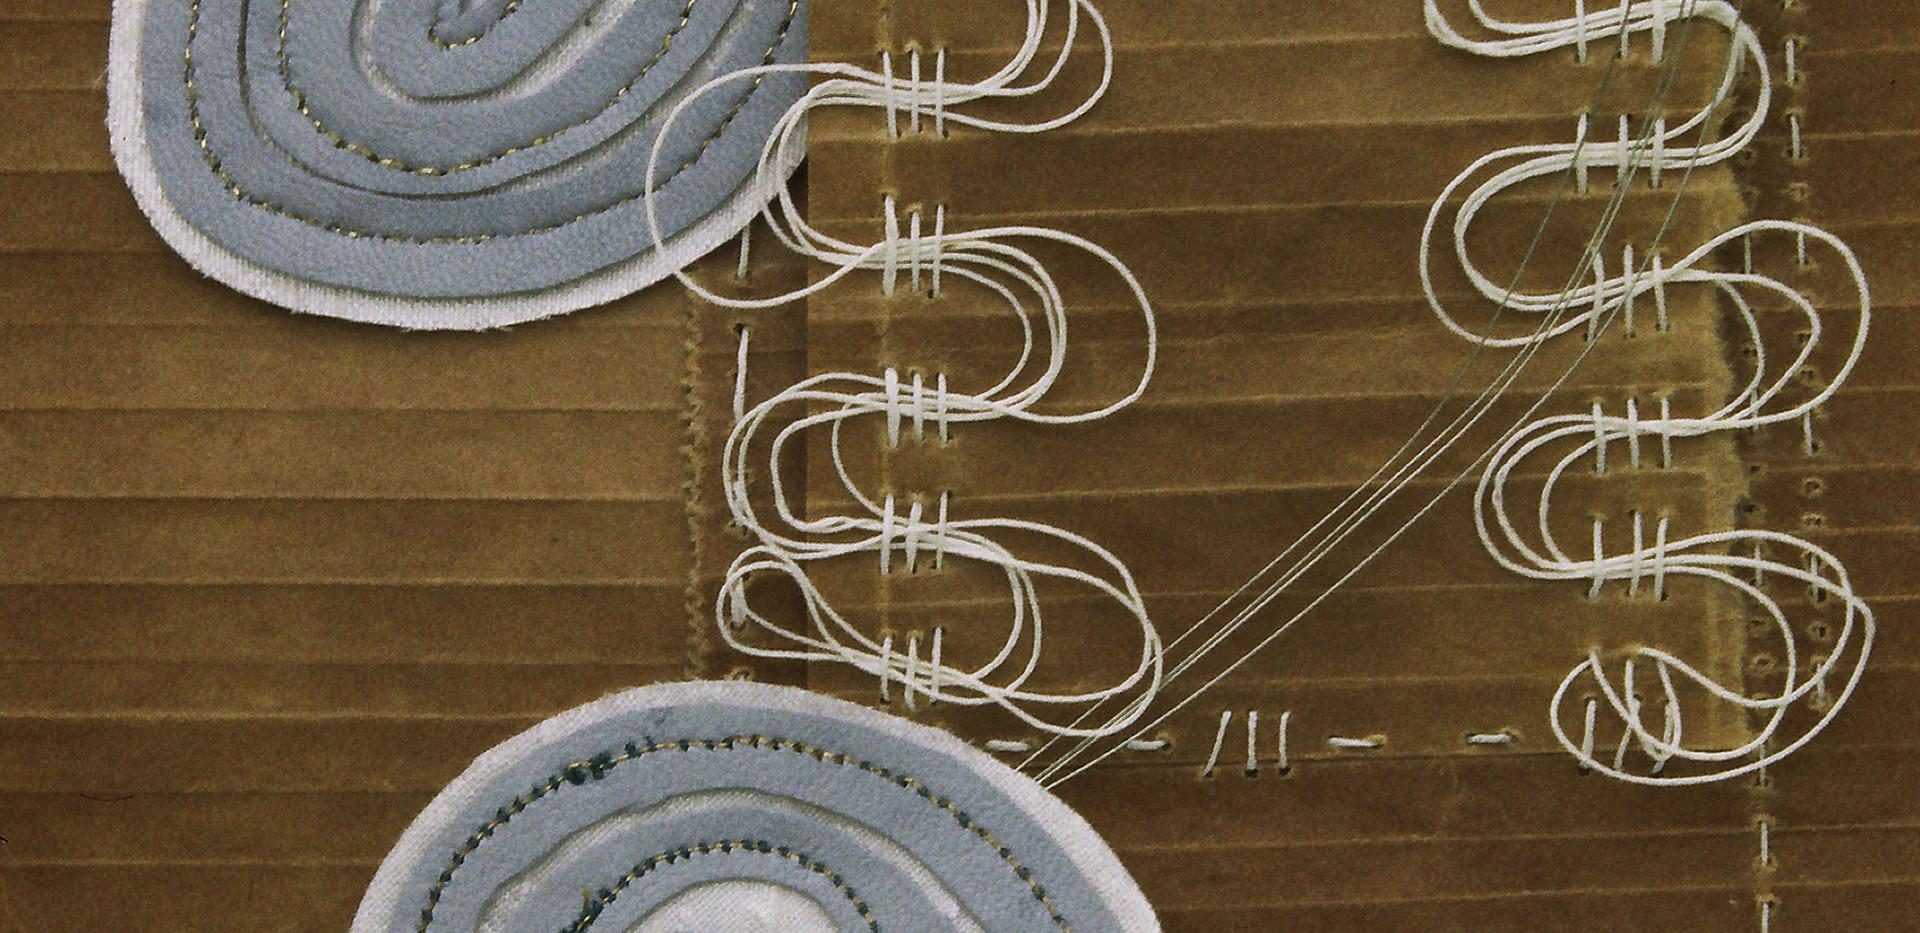 Ebb & flow detail